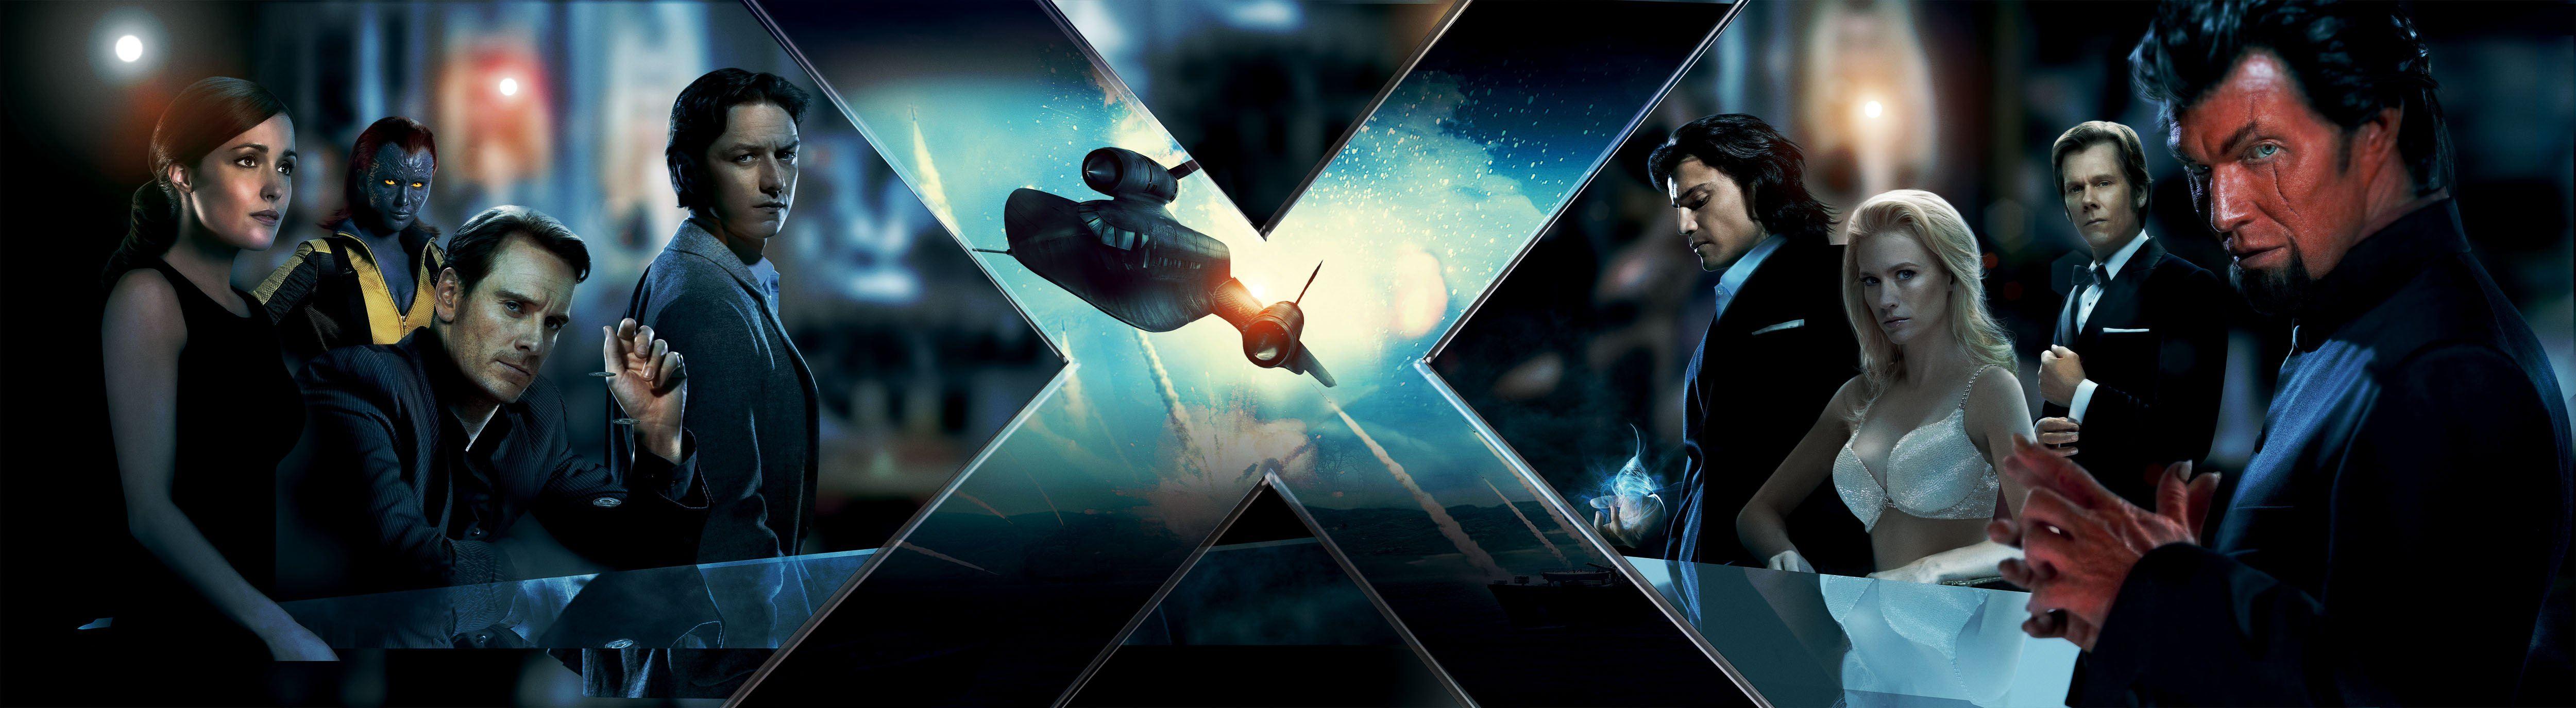 http://images.wikia.com/xmenmovies/images/9/99/X-Men_First_Class_UK_Banner.jpg